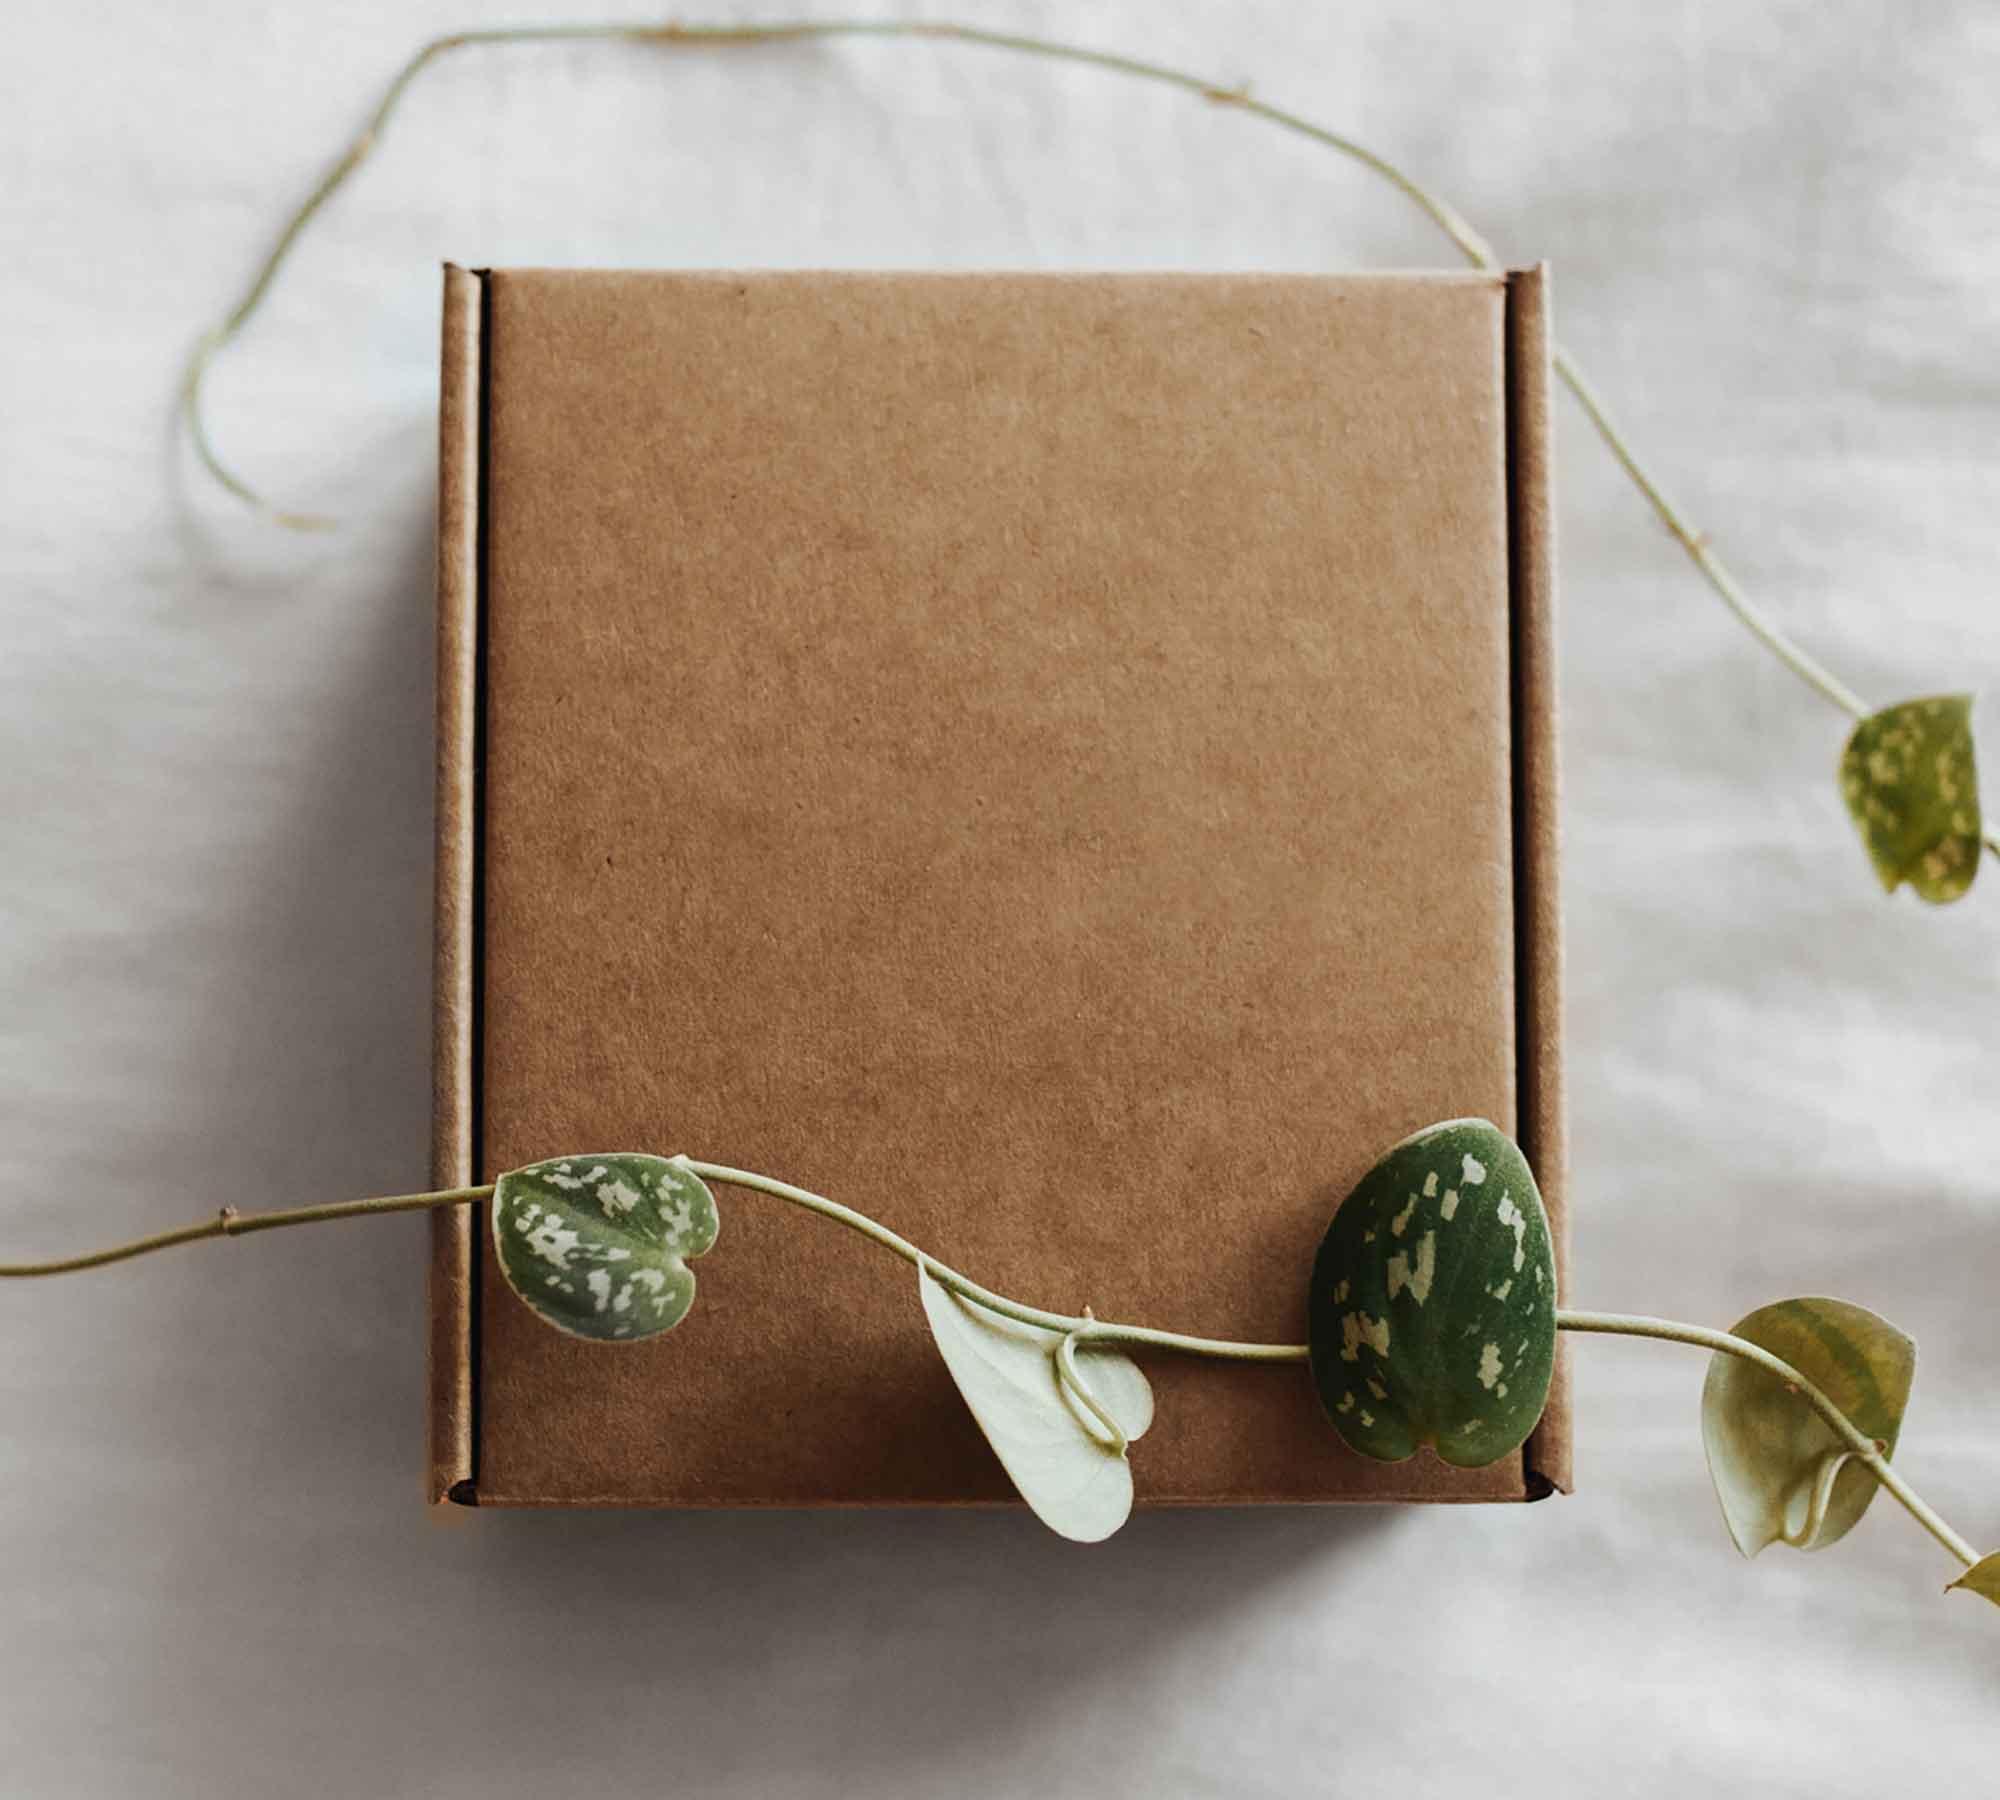 Craft Paper Box Mockup 2